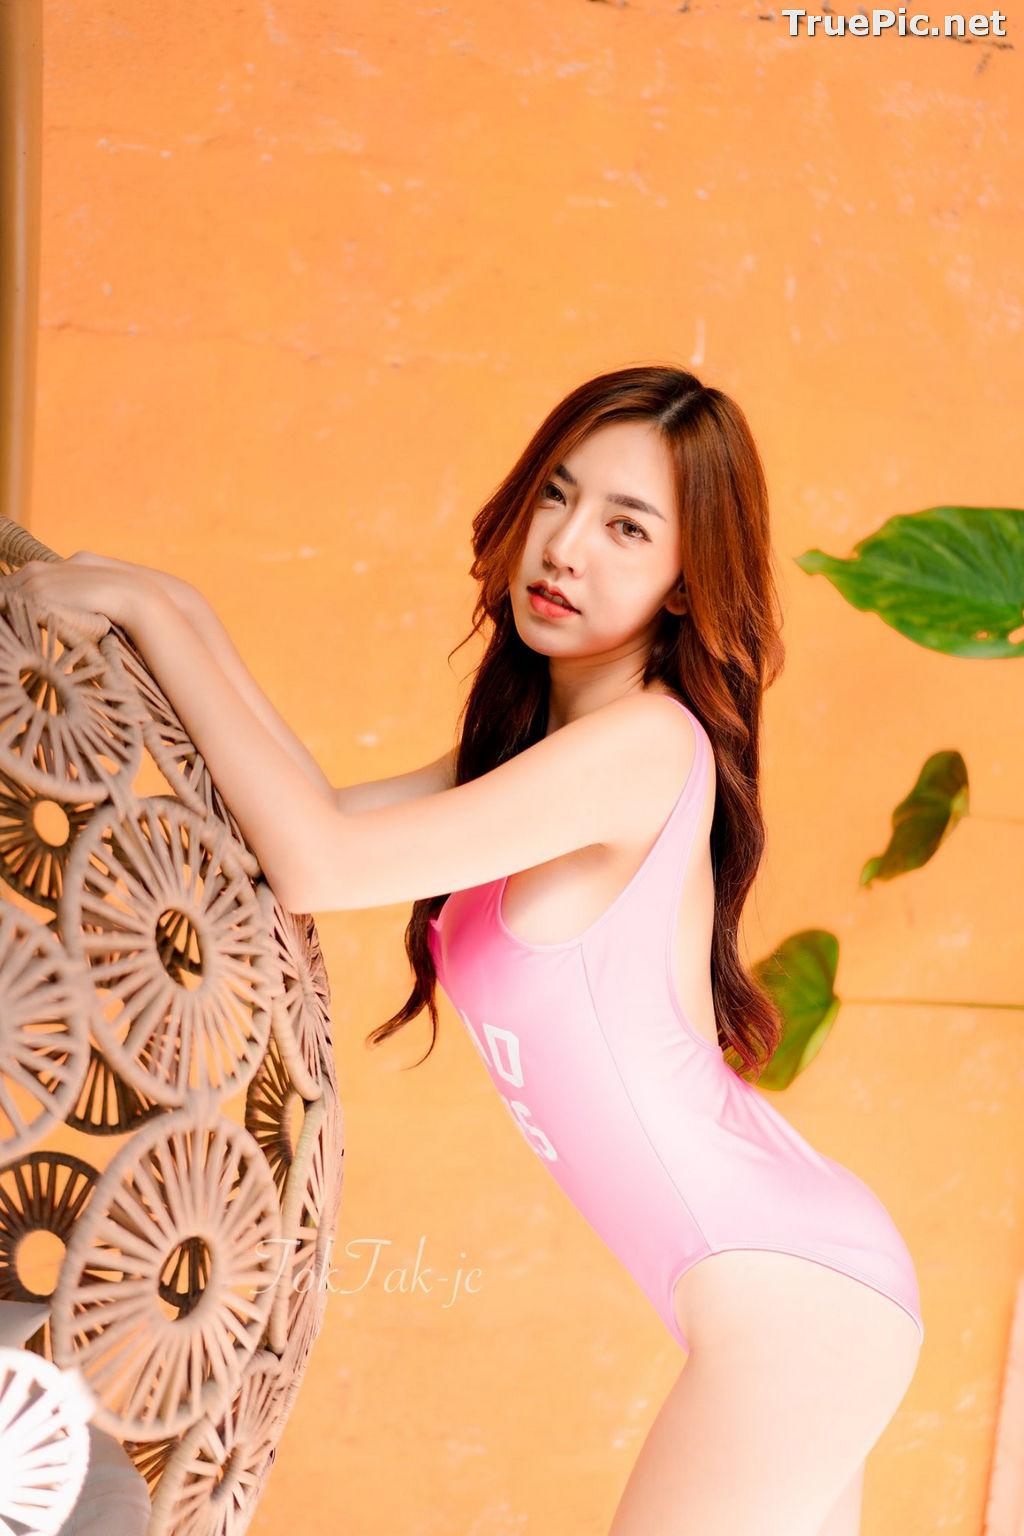 Image Thailand Model - Champ Phawida - Let's Swim With Pink Monokini - TruePic.net - Picture-8